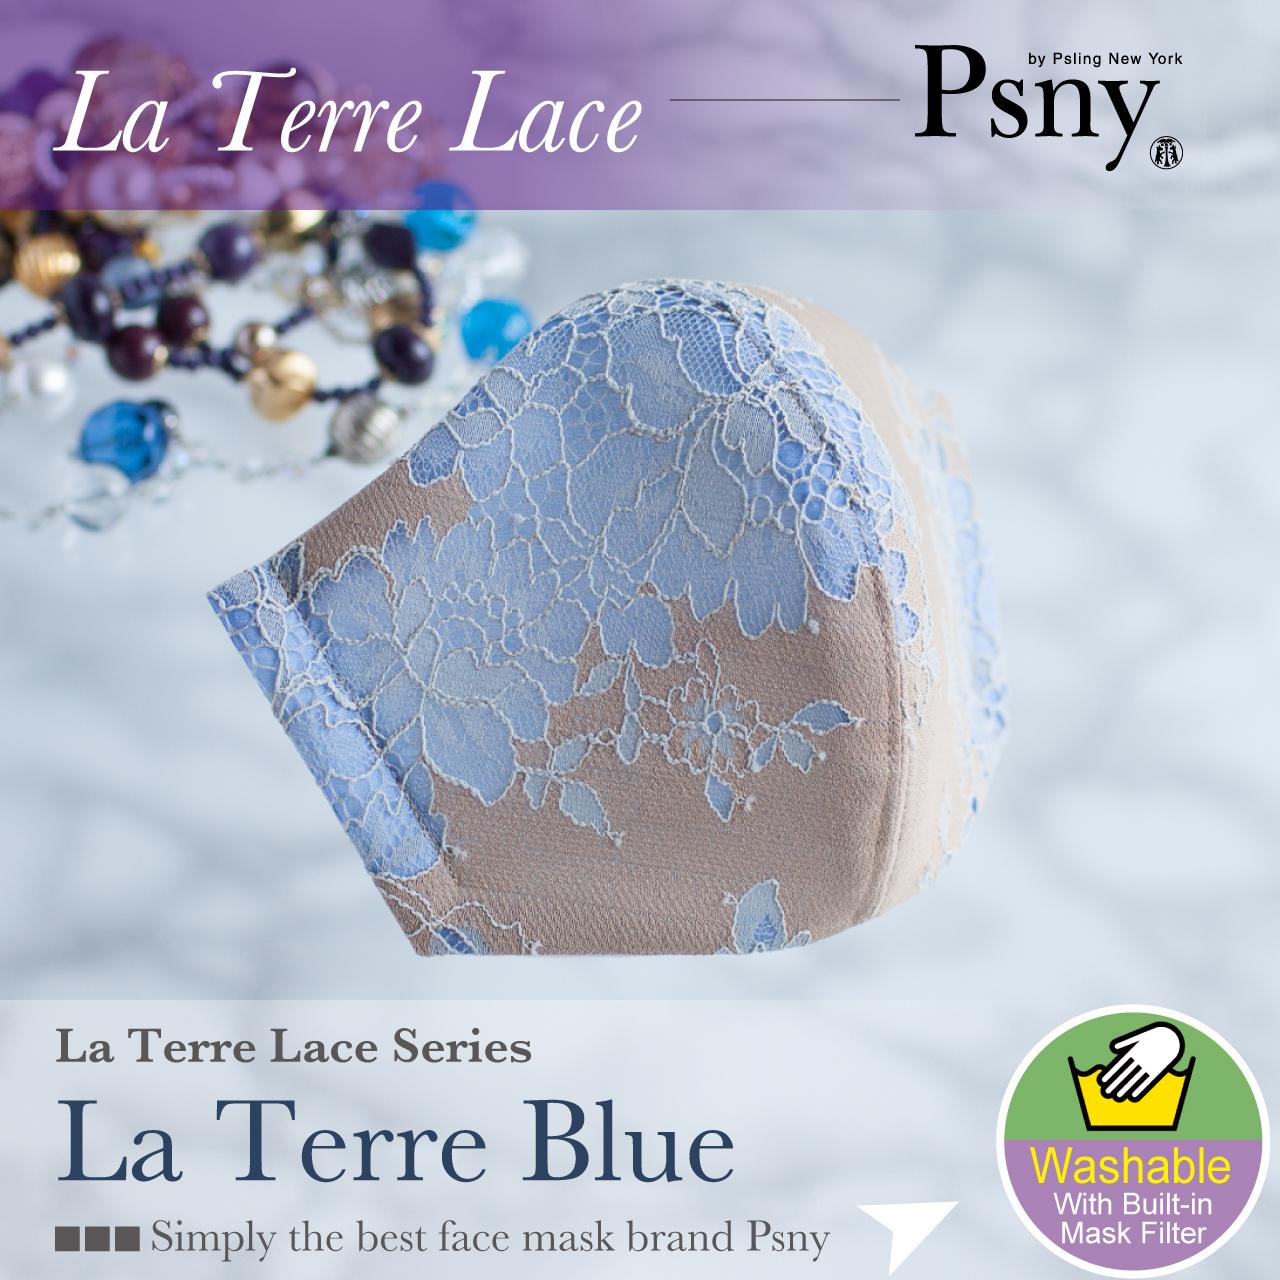 PSNY レース ラ・テール・シルク 花粉 黄砂 不織布フィルター入り 立体 美しい 大人用 エレガント マスク 送料無料 LT1